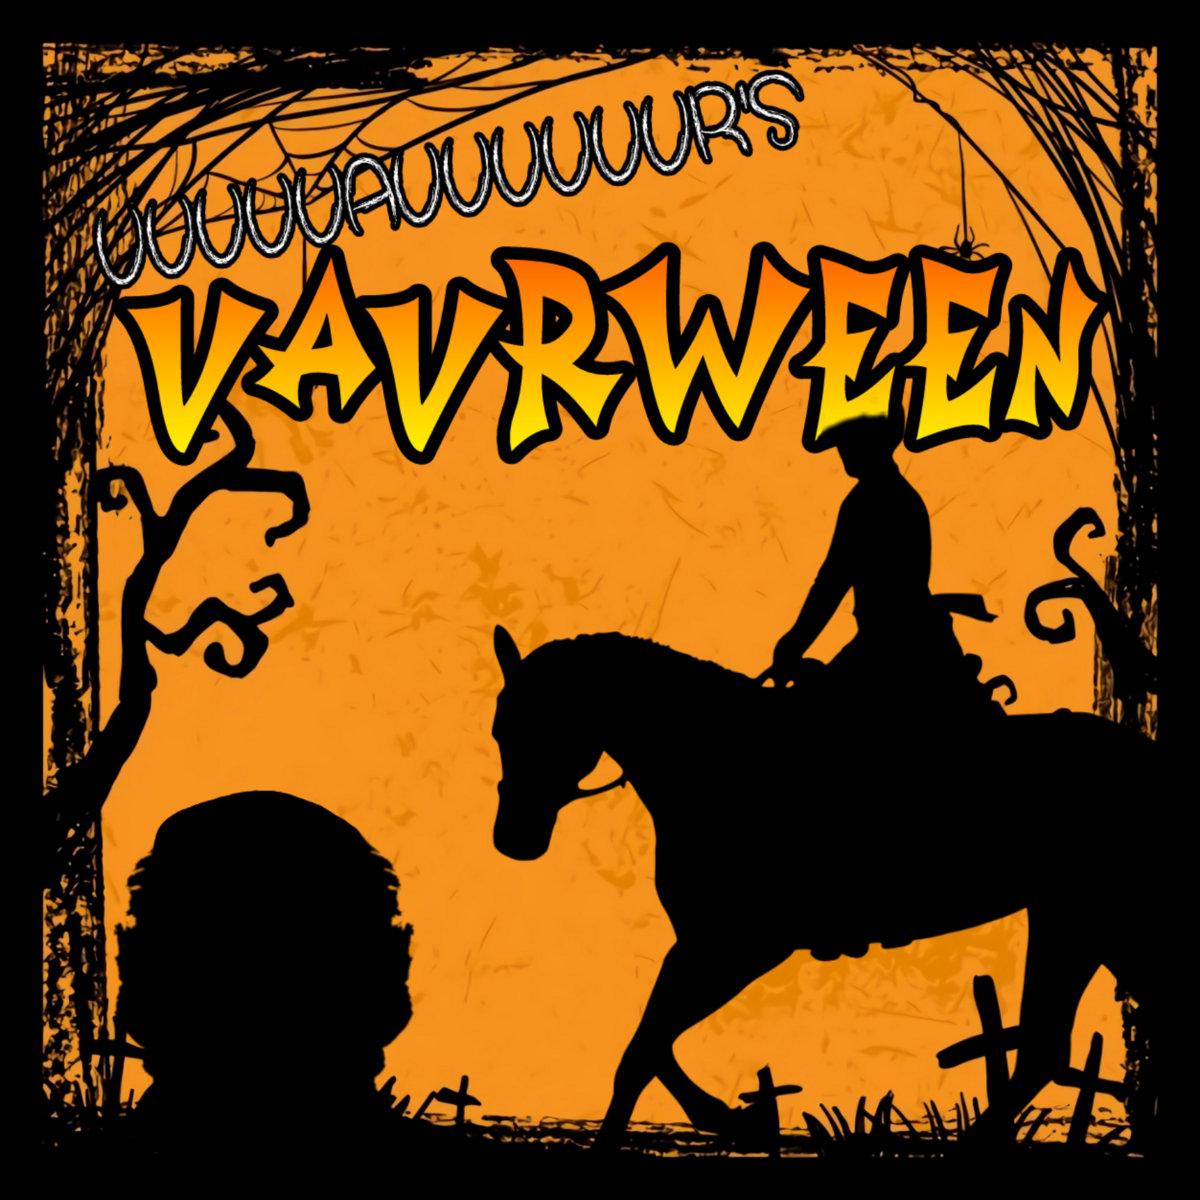 halloween album | vvvvvavvvvvvr